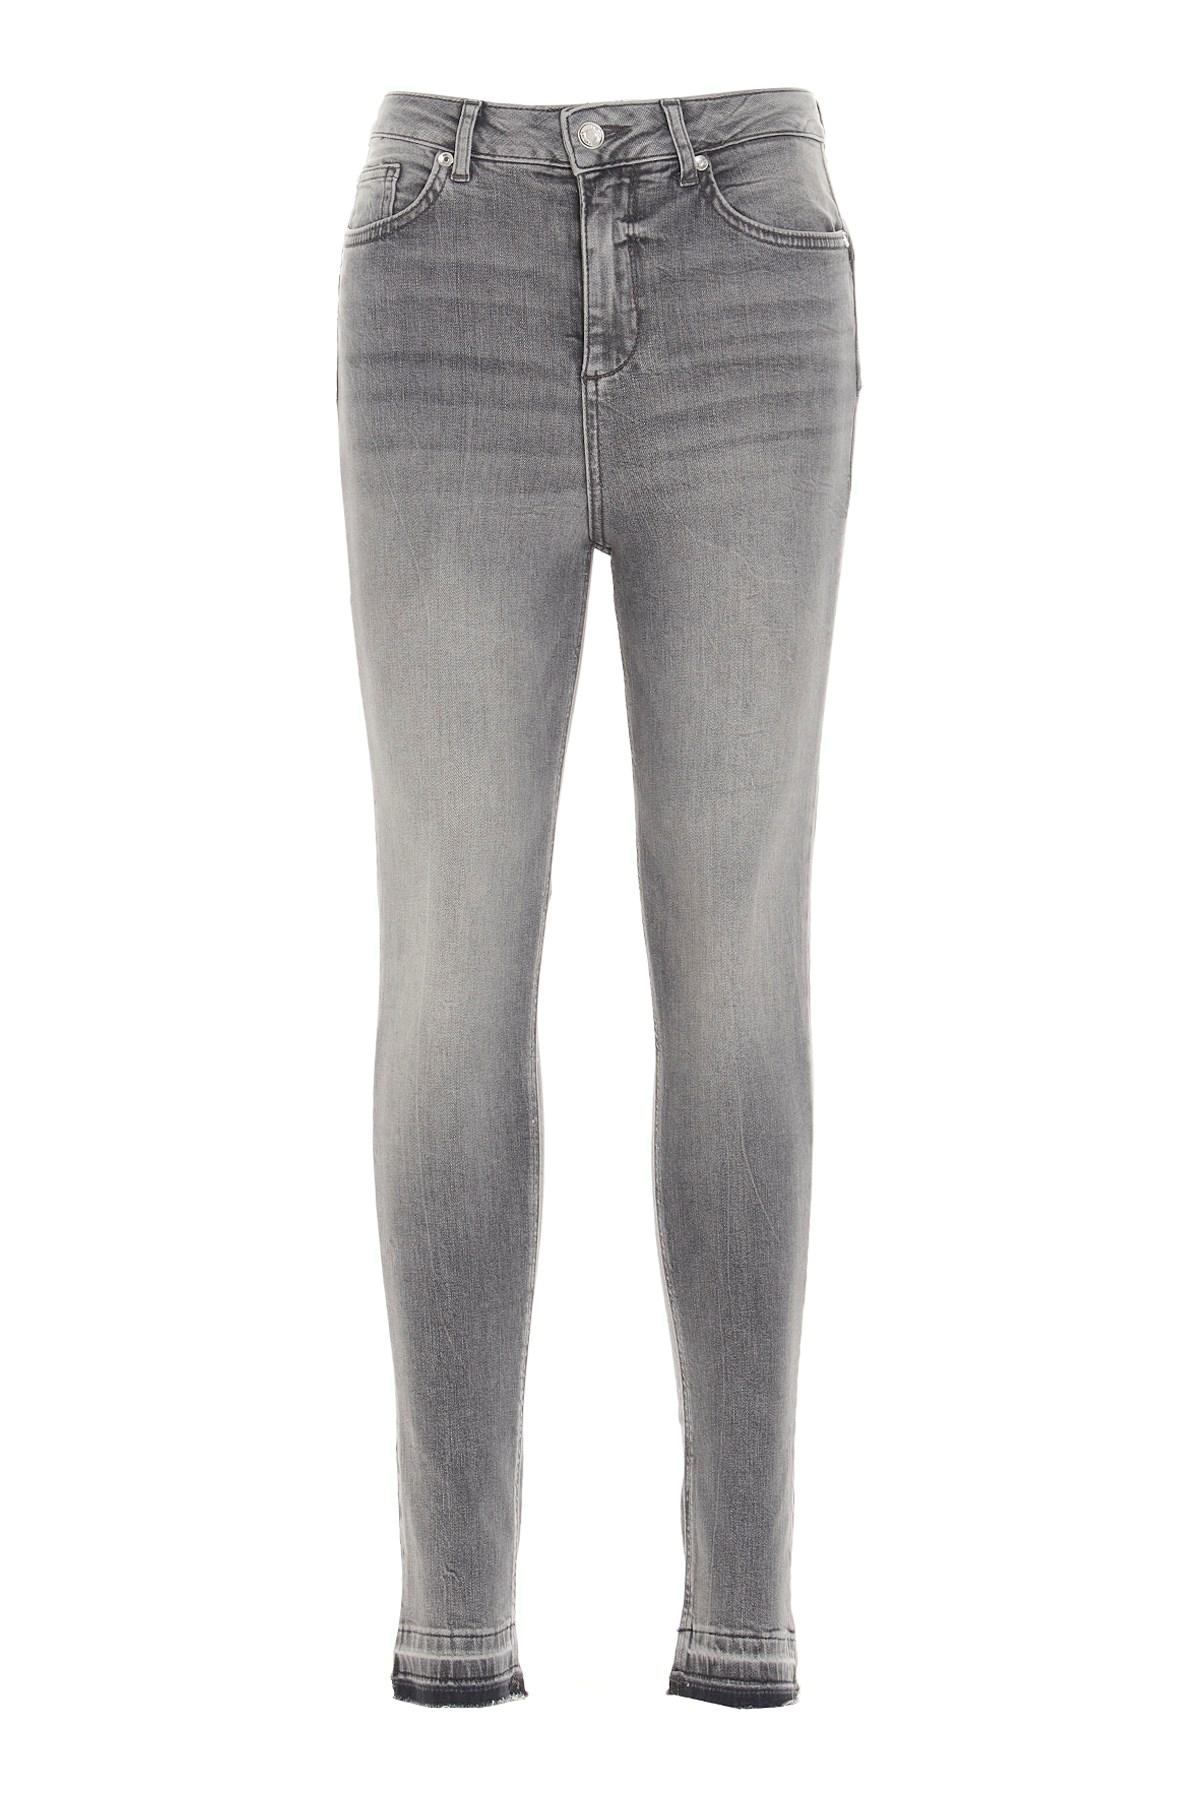 Despertar electo desagradable  liu jo 'Nice super high waist' jeans available on www.julian-fashion.com -  149772 - DE